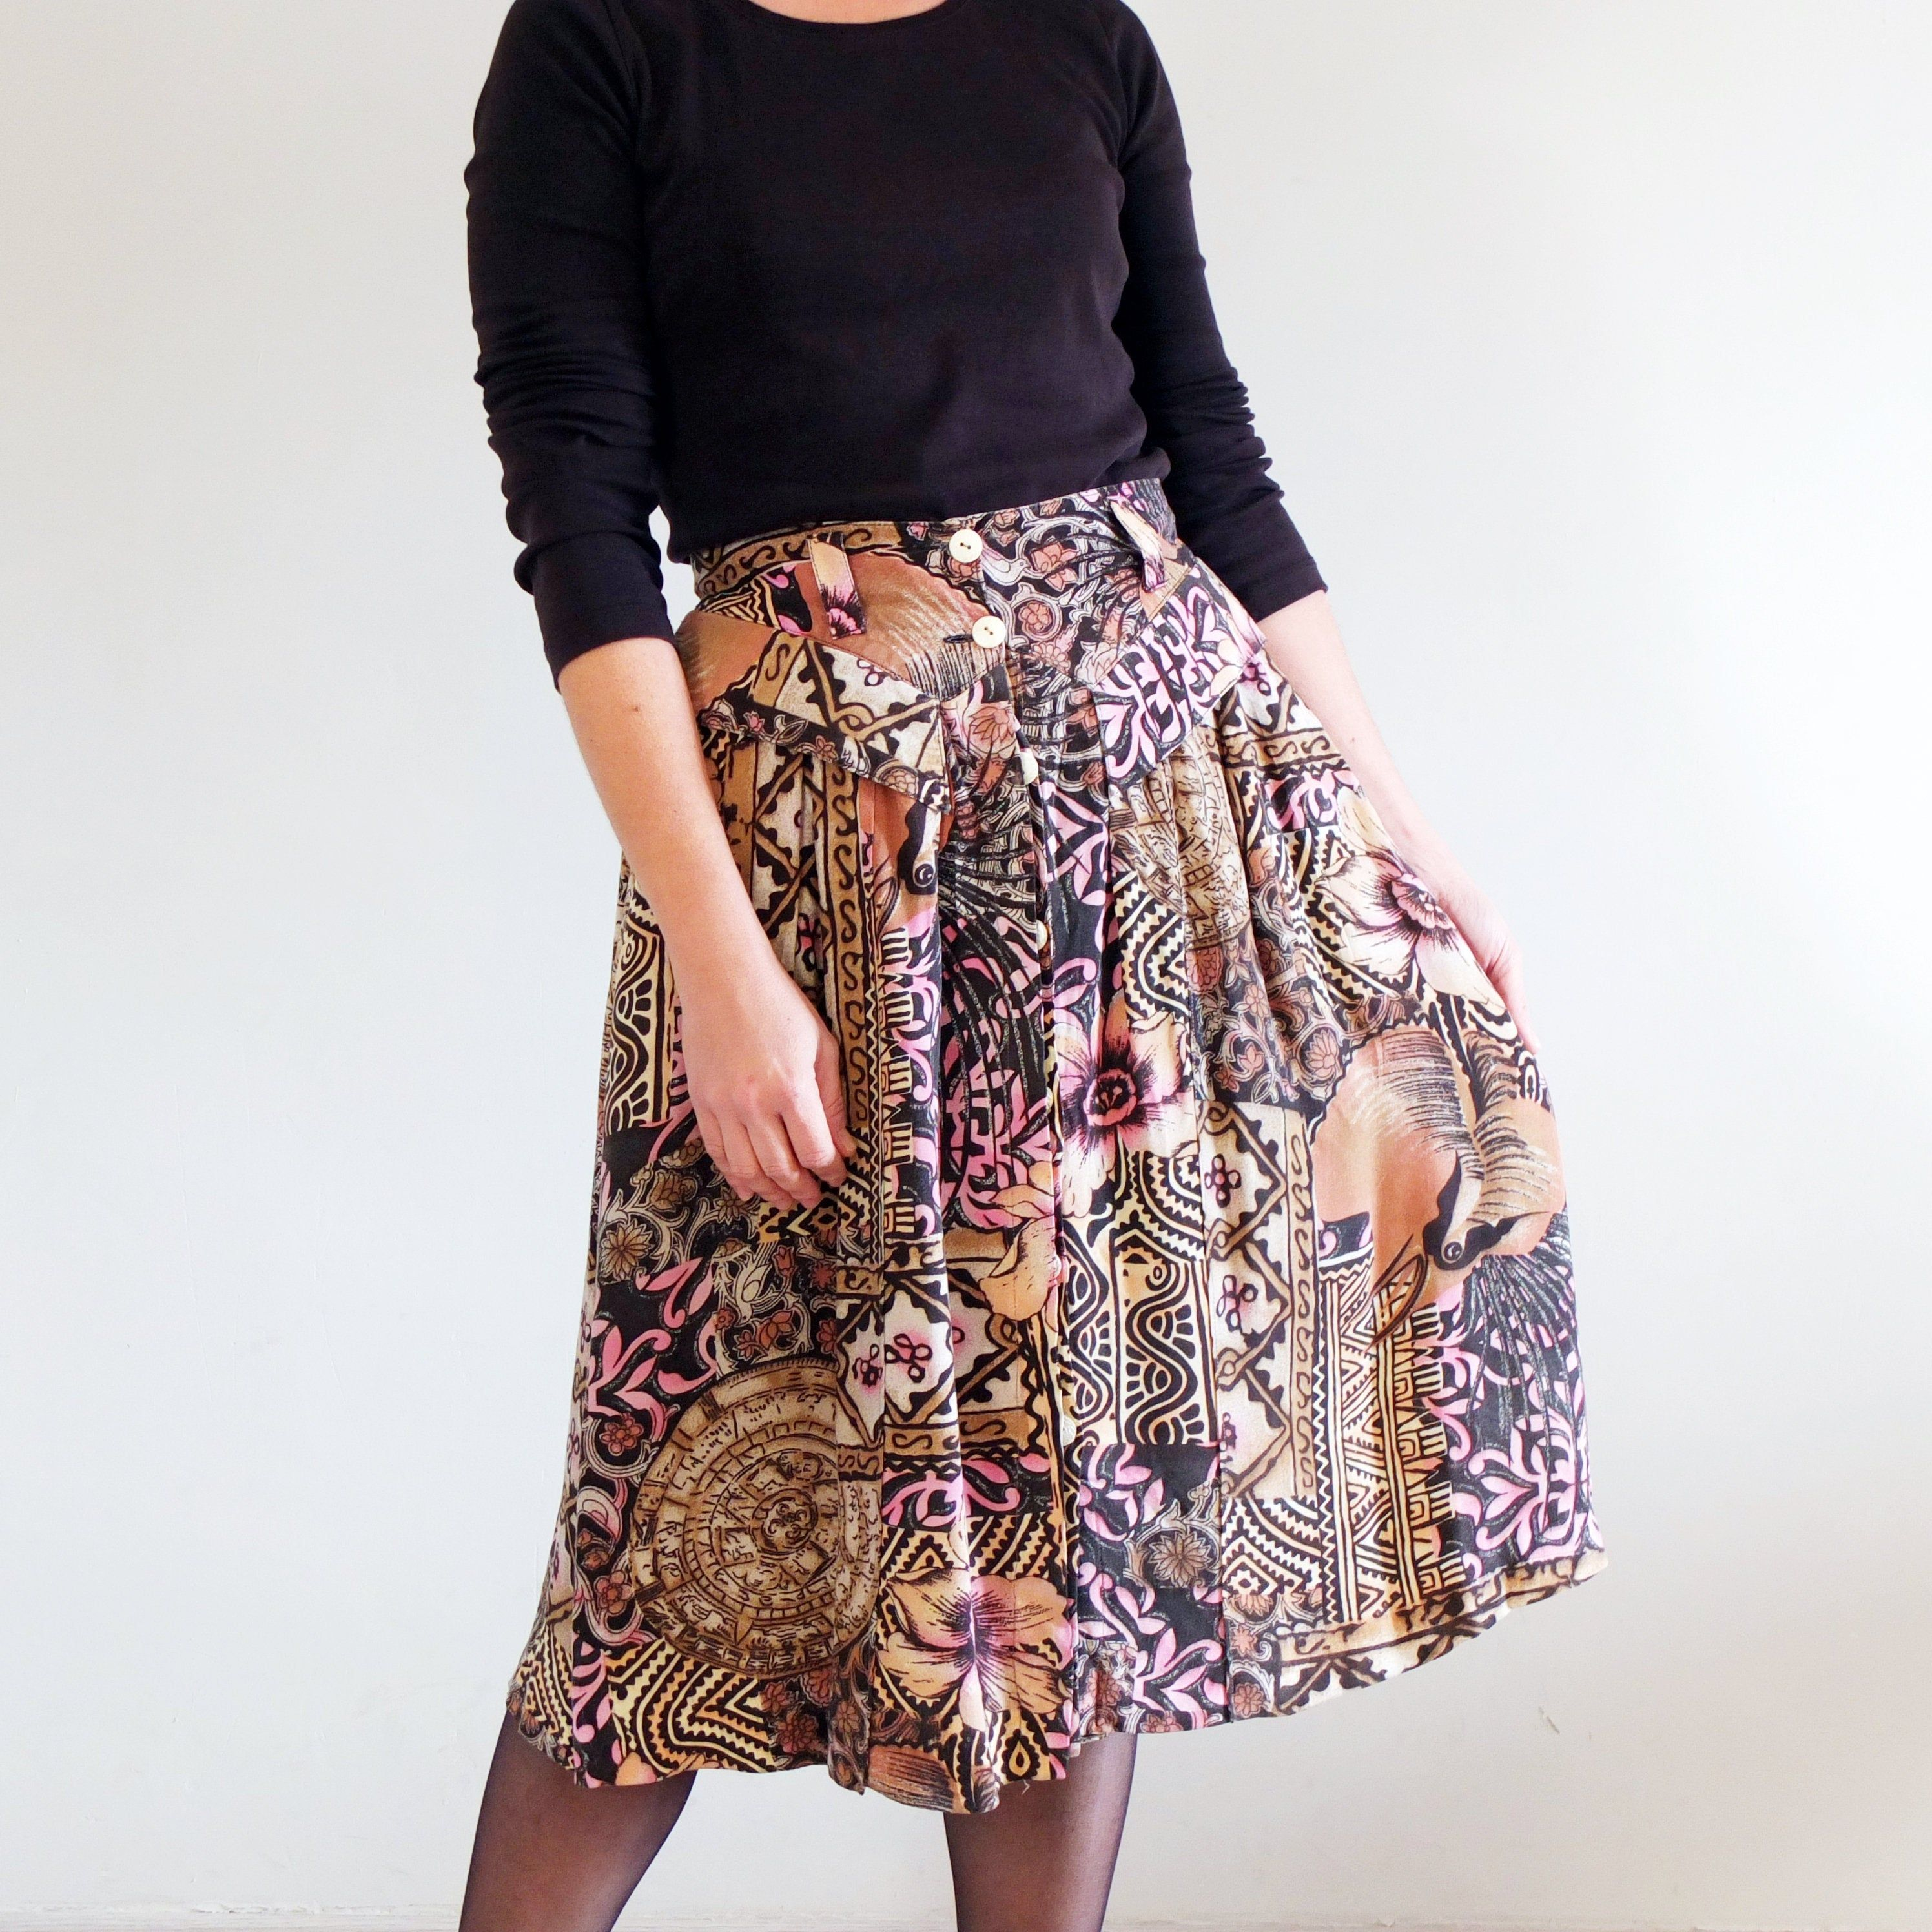 Vintage 80/'s floral print midi skirt Summer hipster chic long skirt Elastic high-waist skirt Made in England